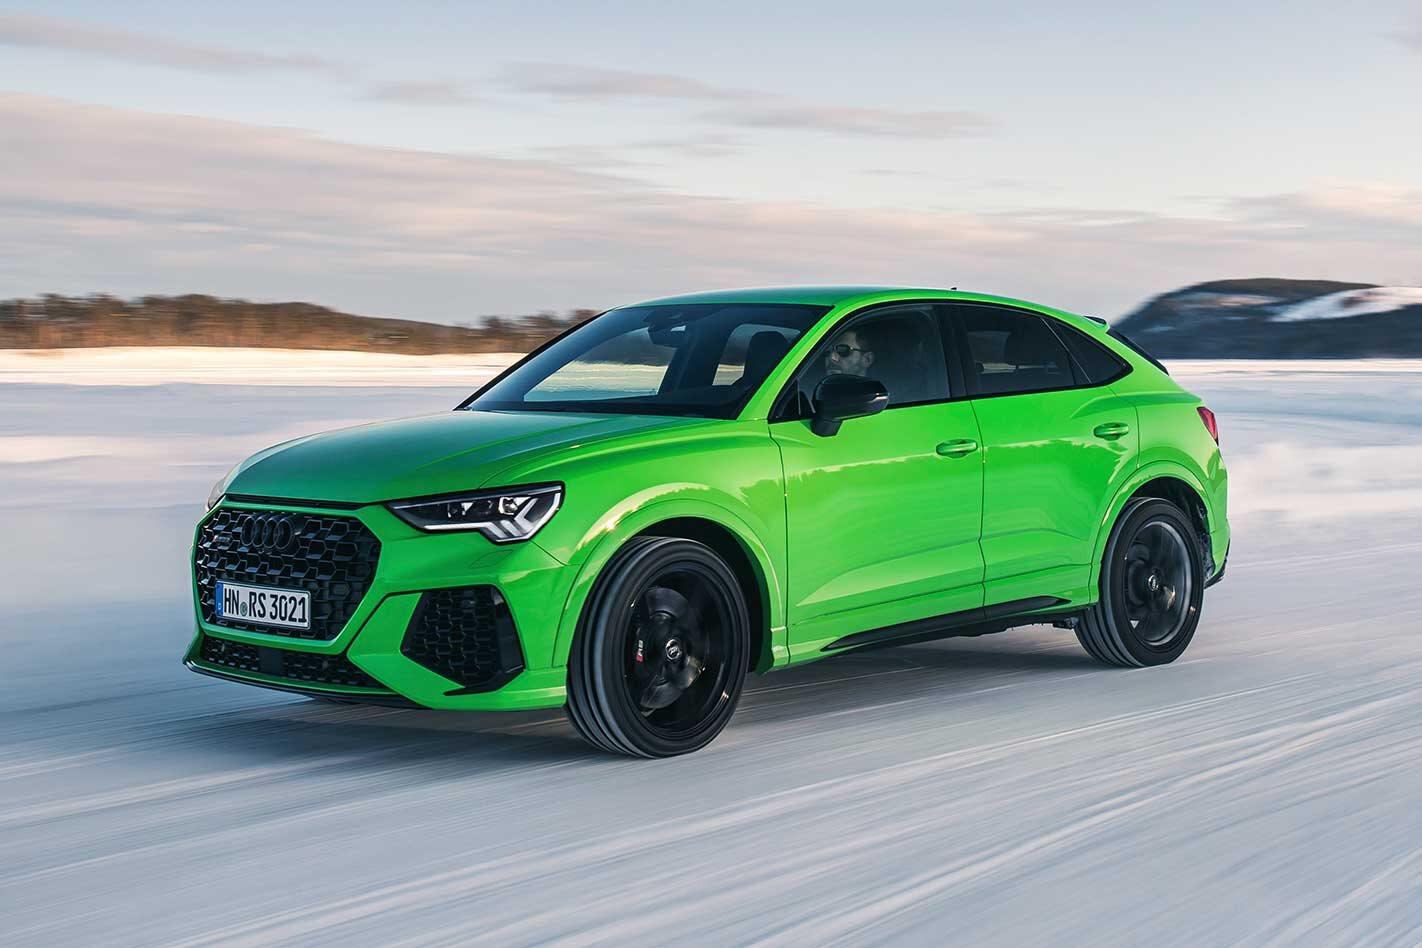 Audi RS Q3 Sportback review